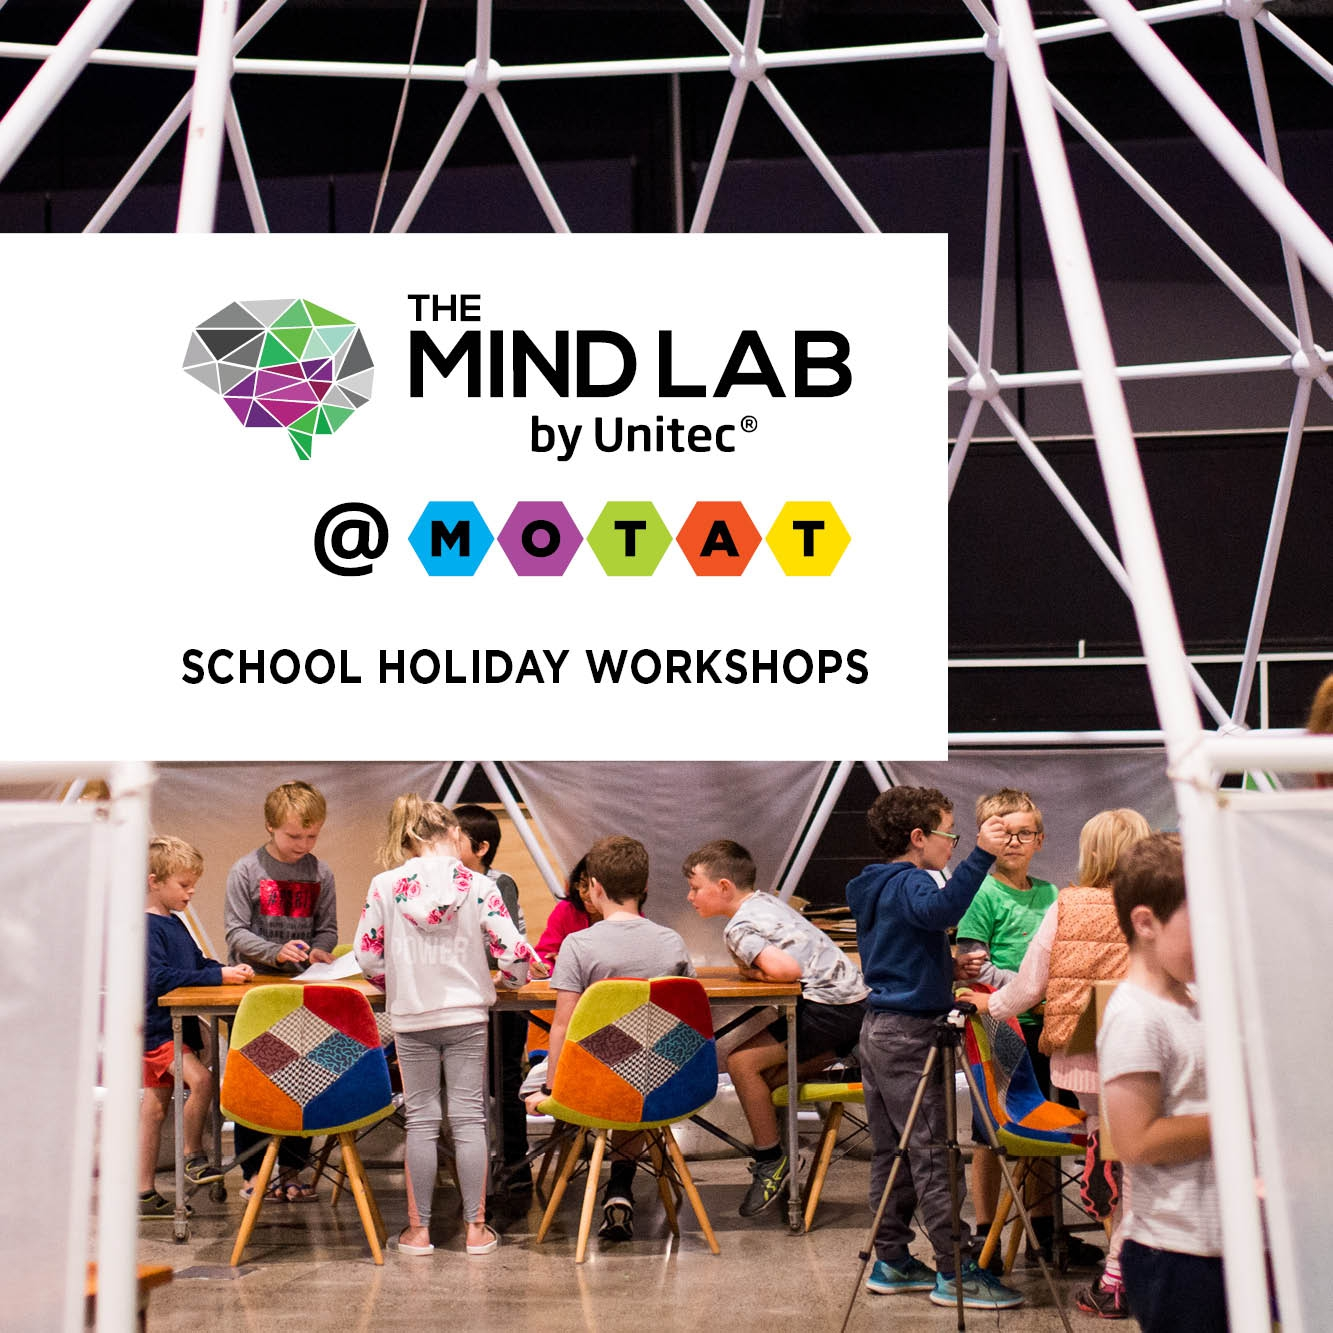 The Mind Lab by Unitec School Holiday Workshops